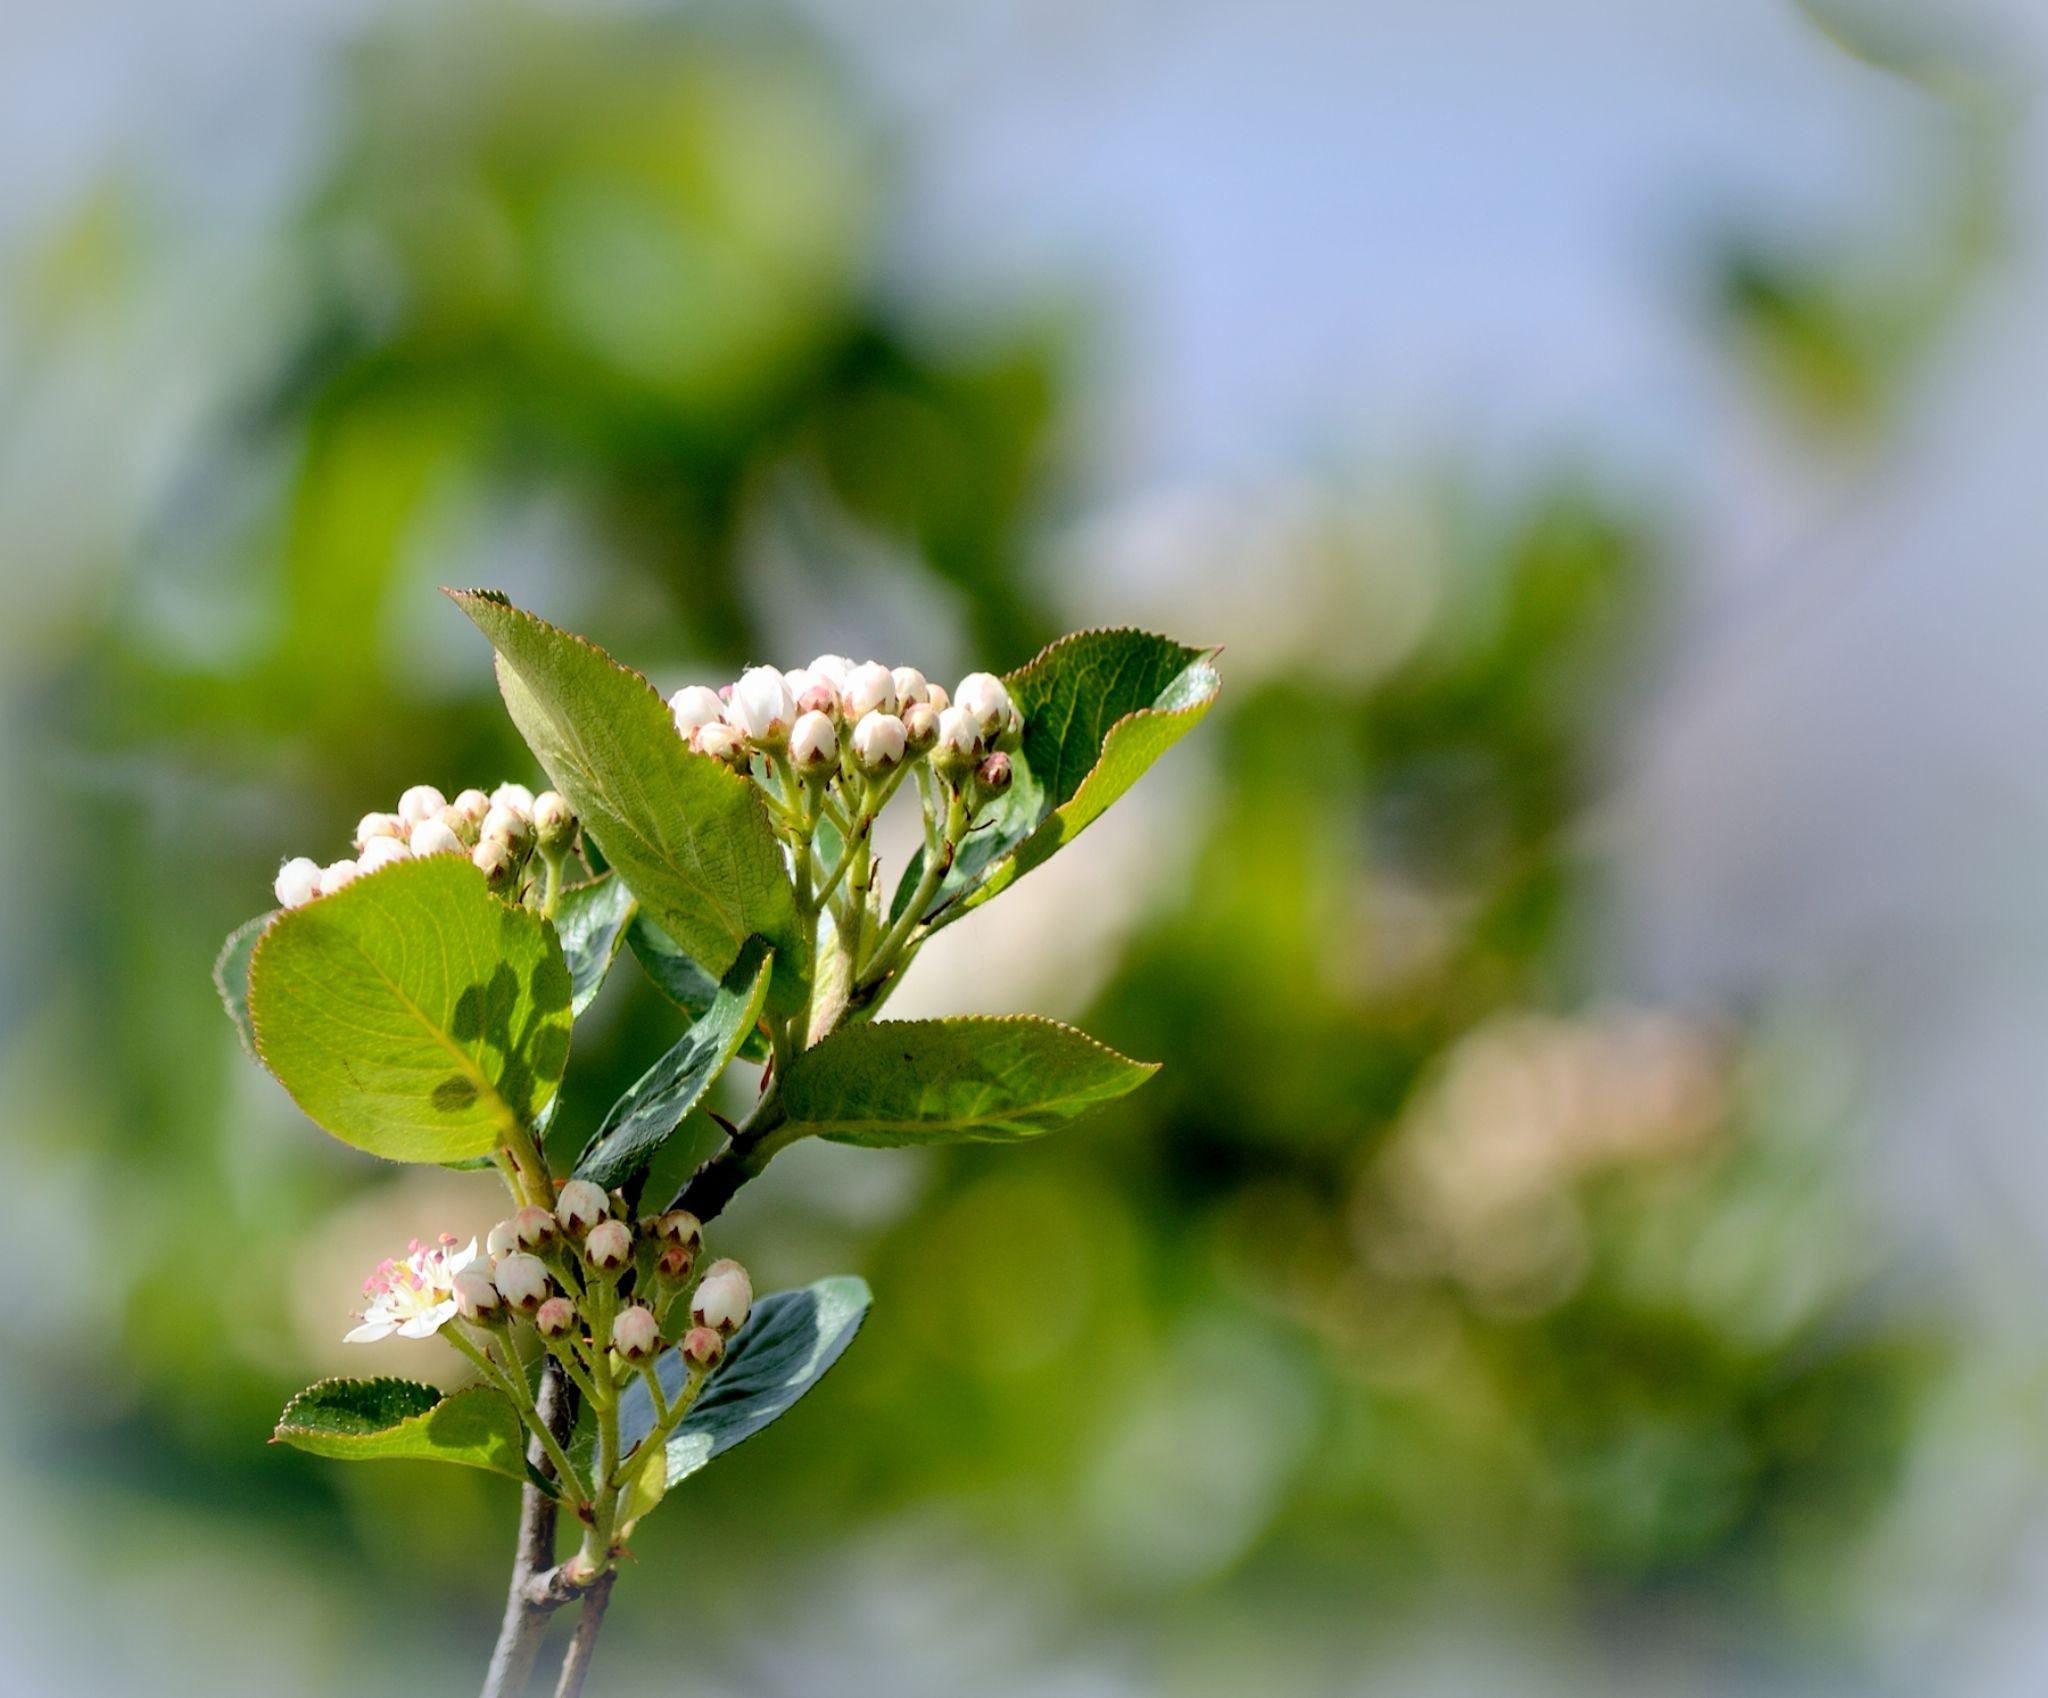 Flowers by habibi27